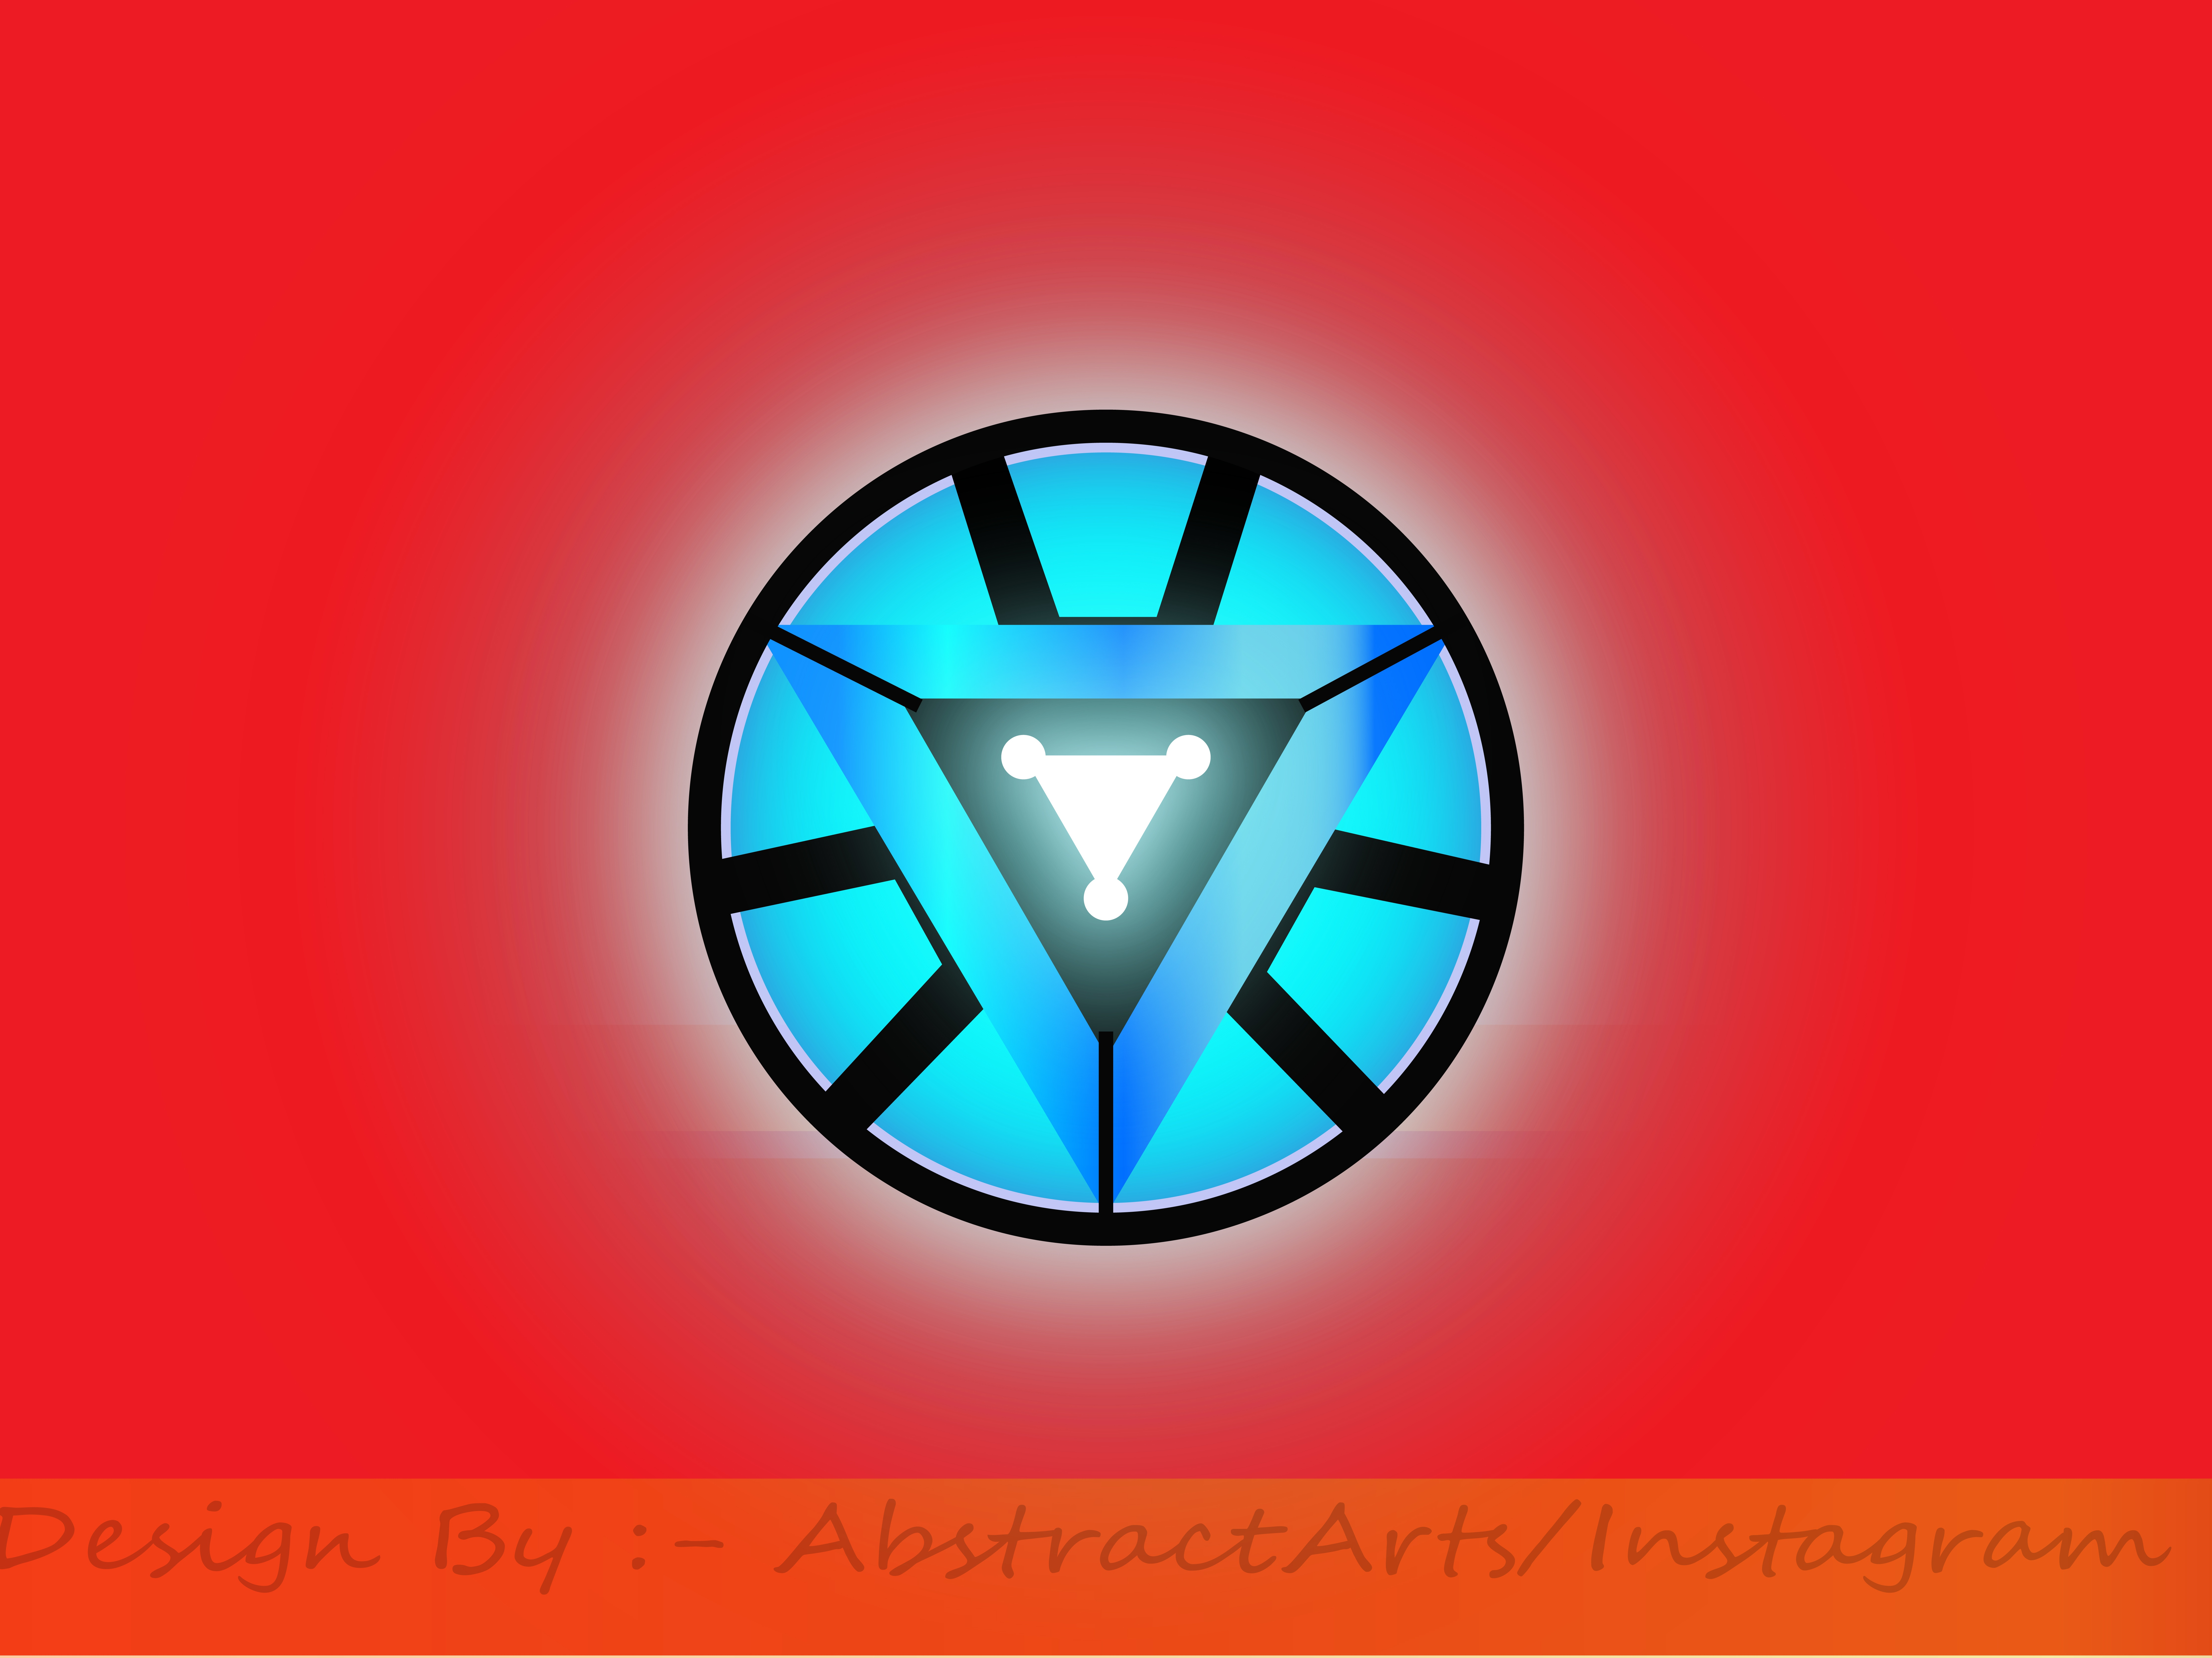 Vector Arc Reactor by Vivek Kumar on Dribbble